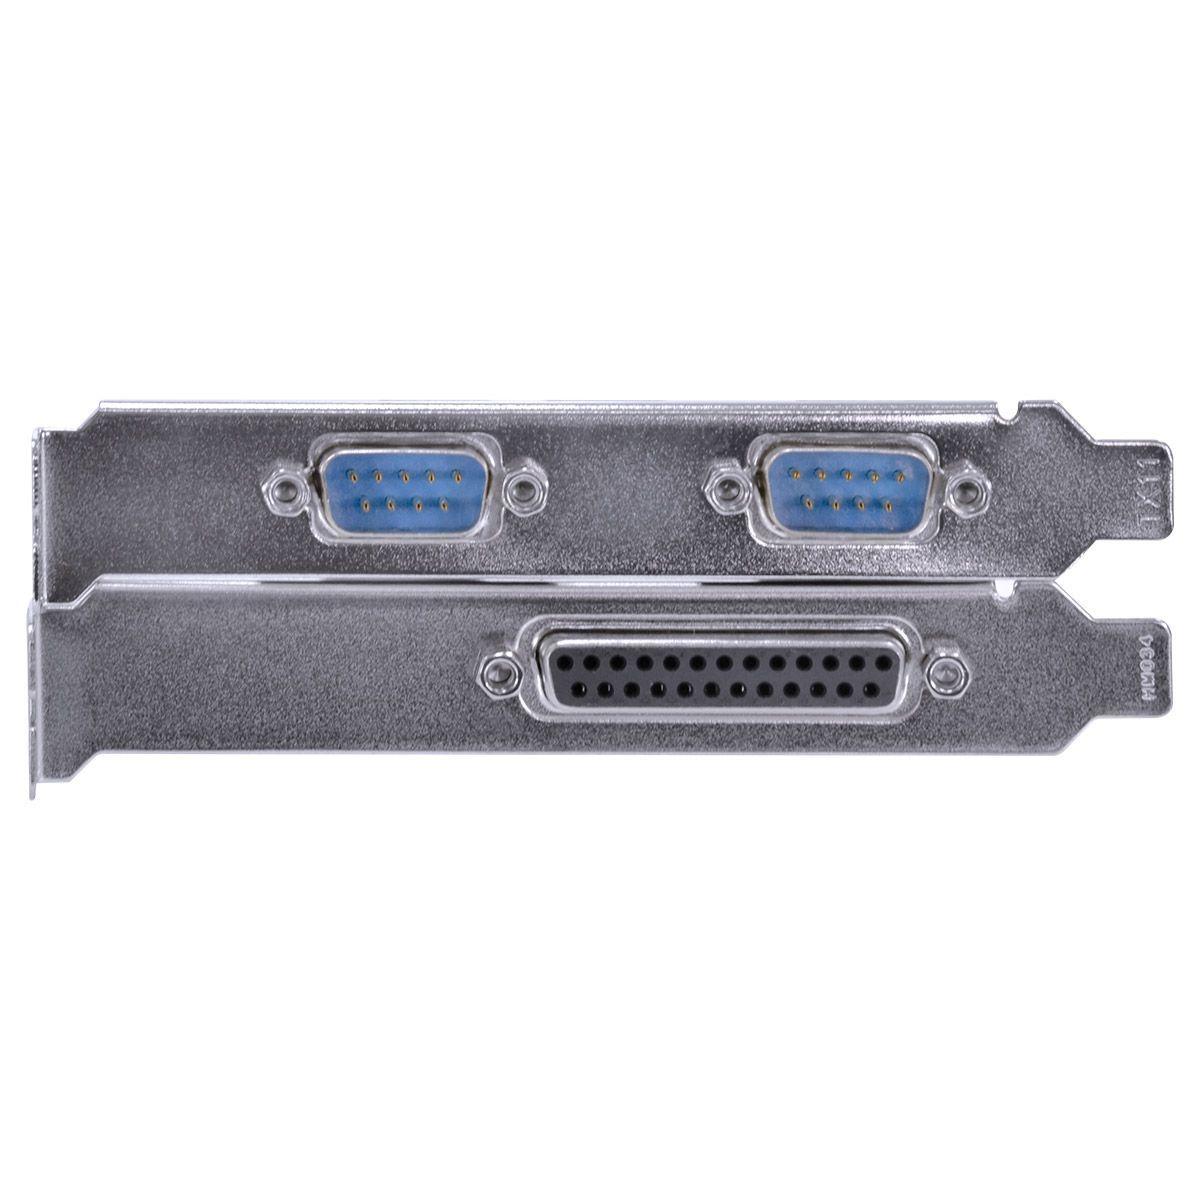 PLACA SERIAL COM 2 SAÍDAS RS232 RS485 RS422 + 1 SAÍDA PARALELA IEEE1284 PCI X1 - P2IE1PR-PCI vinik